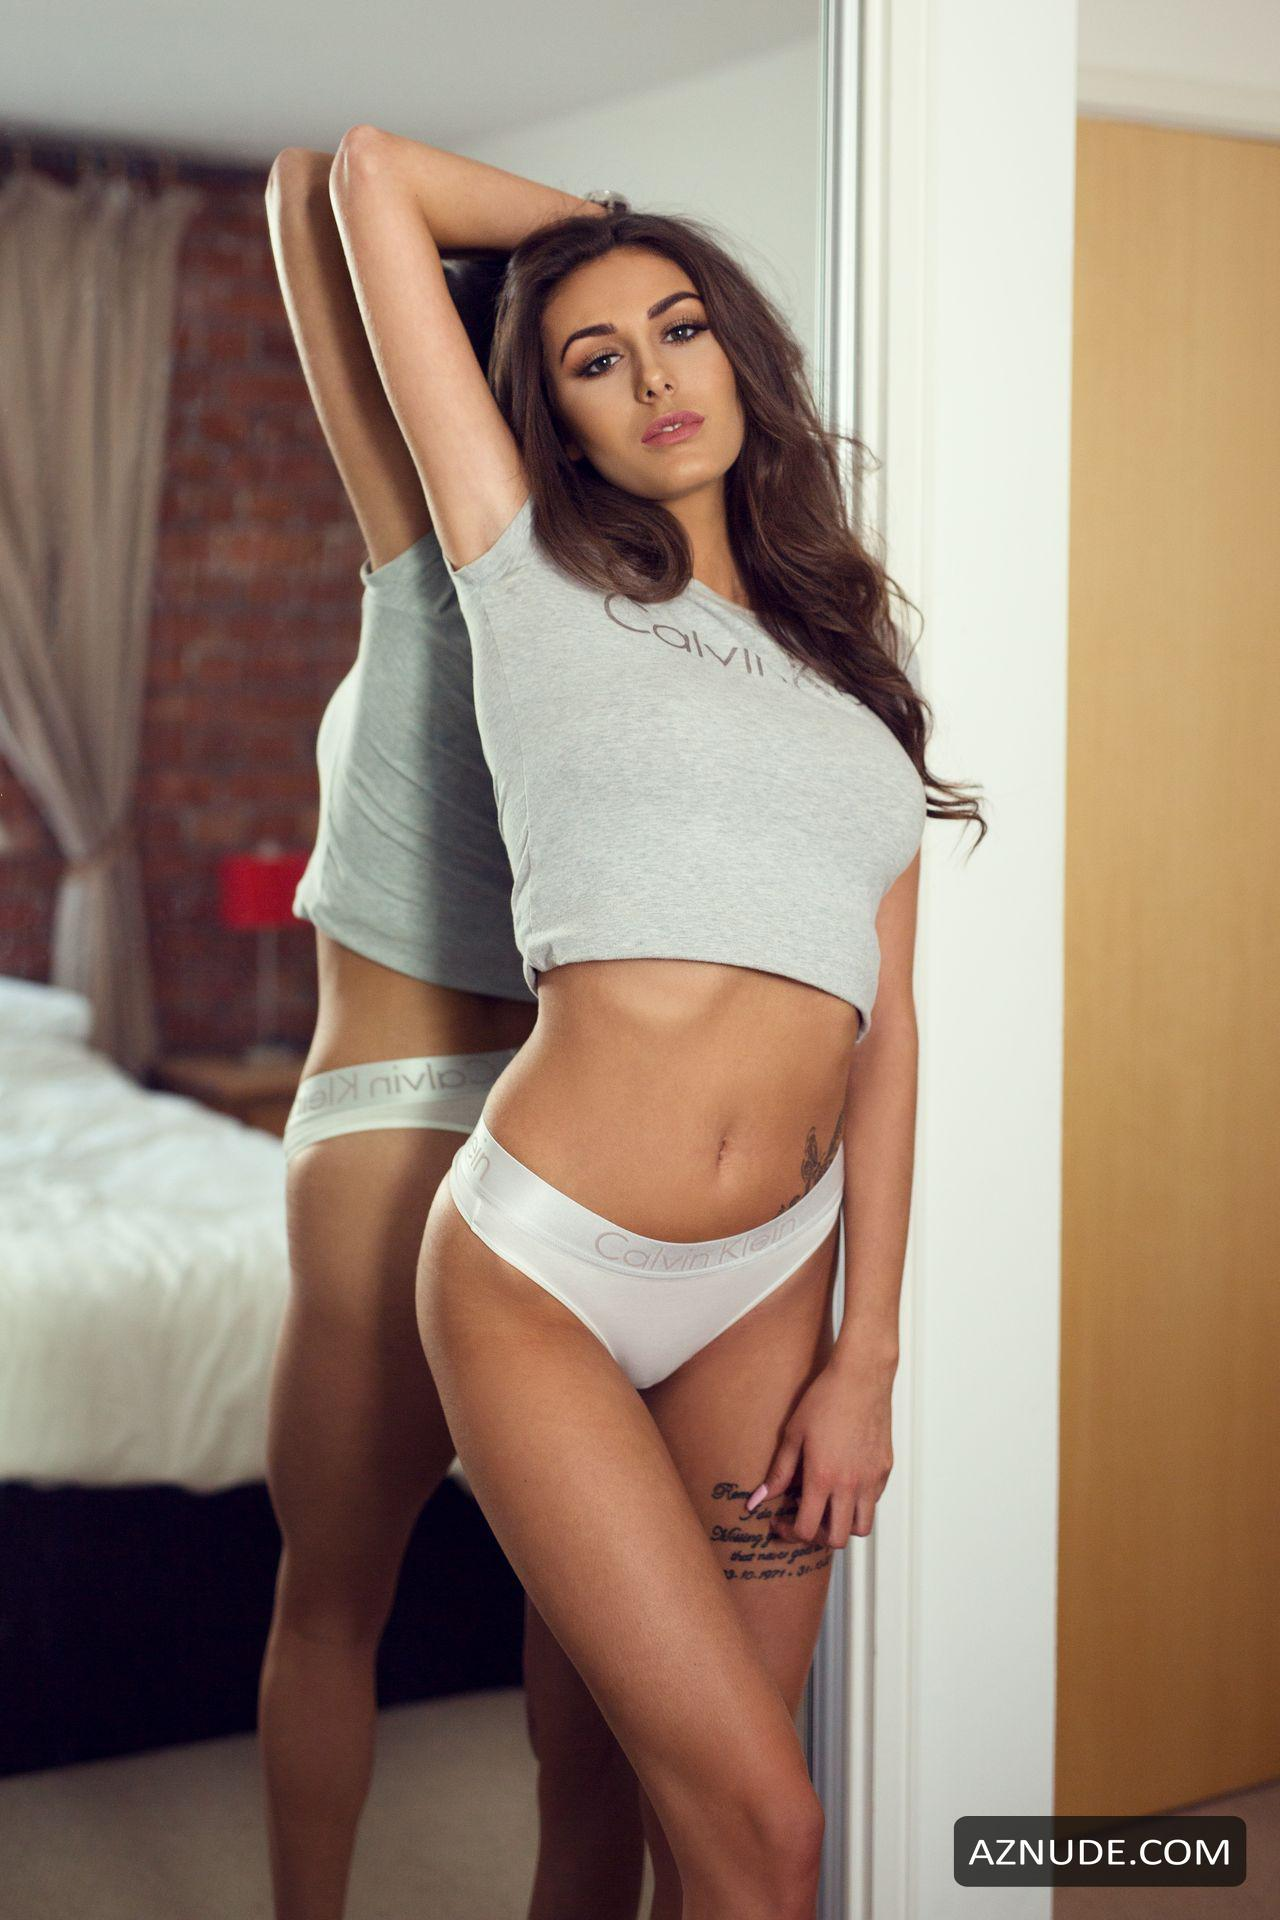 Chloe Veitch Nude photo 2